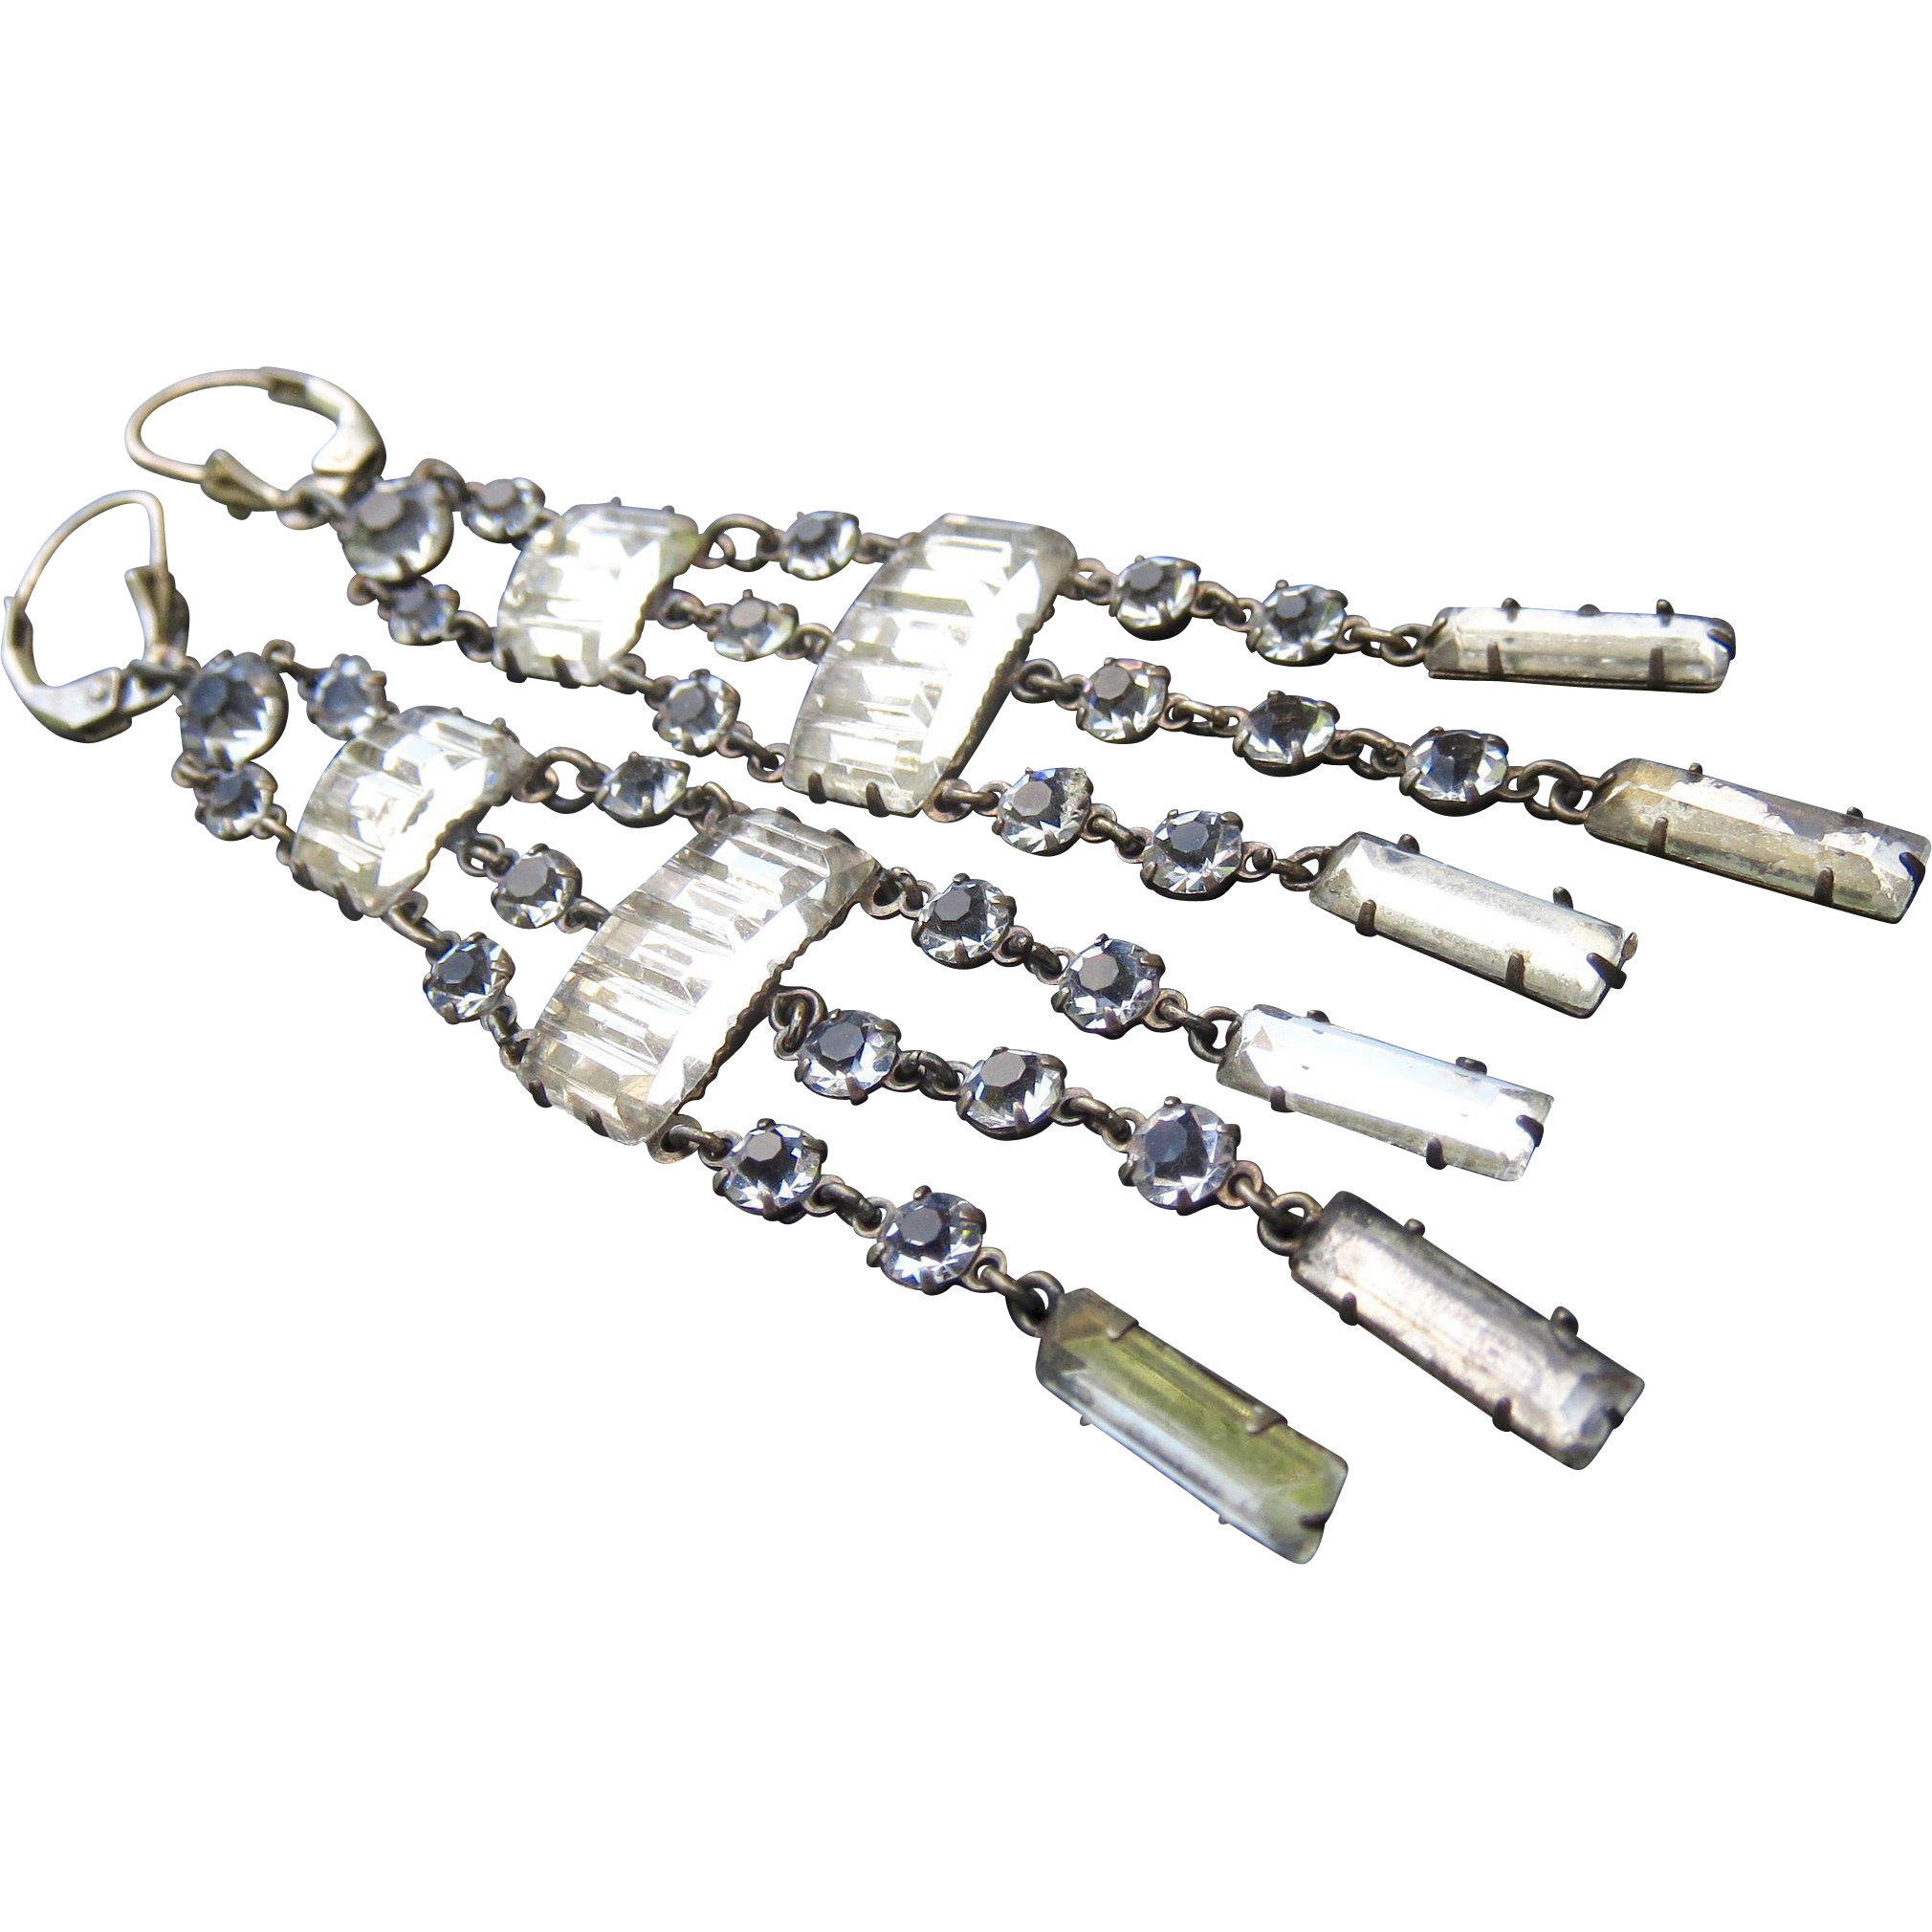 Rare Antique Sterling Paste Crystal Long Flapper Earrings - Chandelier Shoulder Dusters!